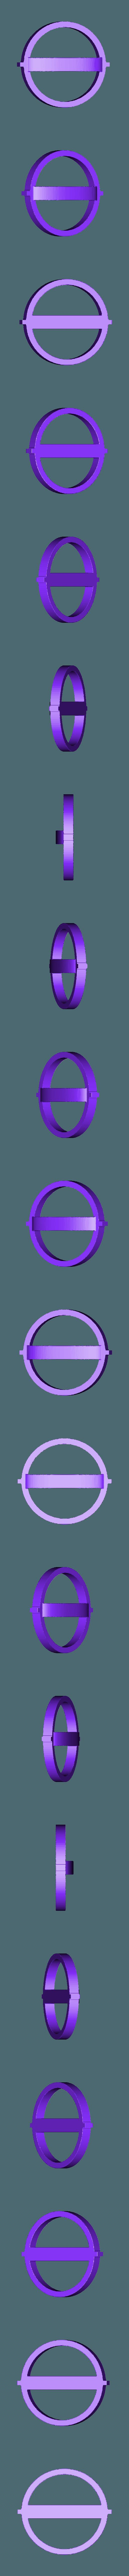 Lock_mark2.stl Download free STL file Mask 3D NanoHack 2.0 • 3D printer design, Tonystark112